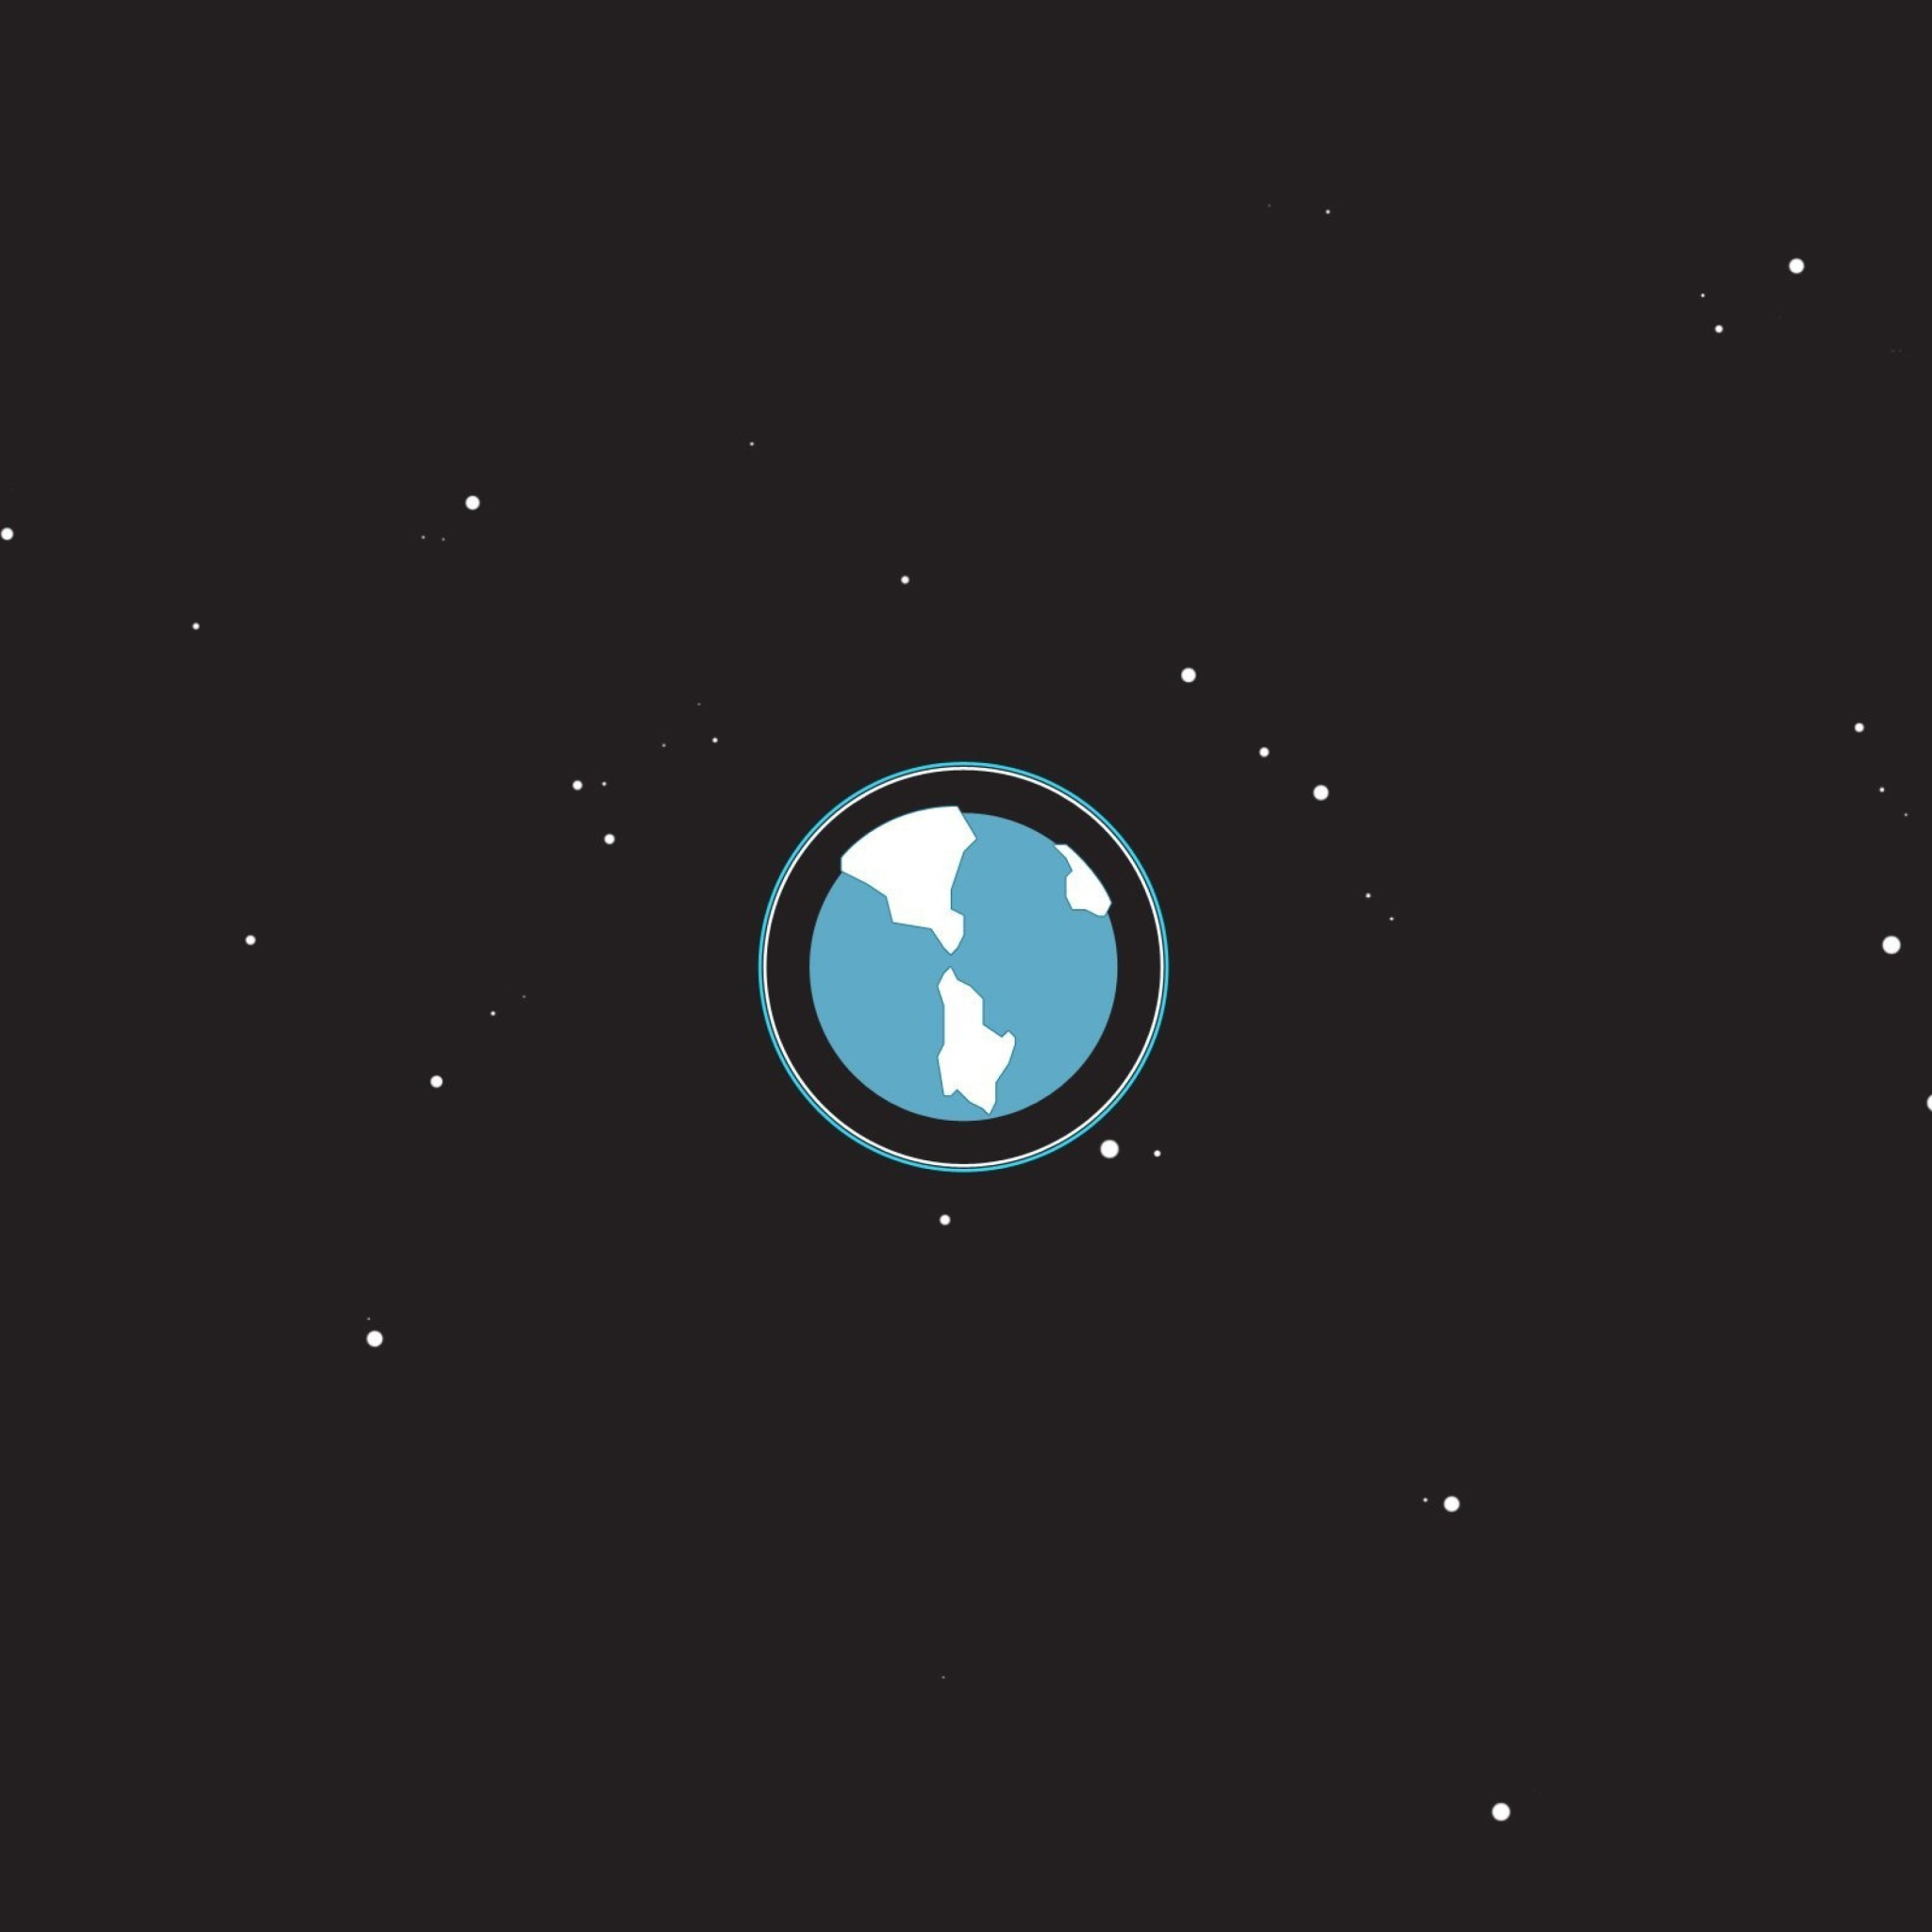 Планета замля минимализм бесплатно